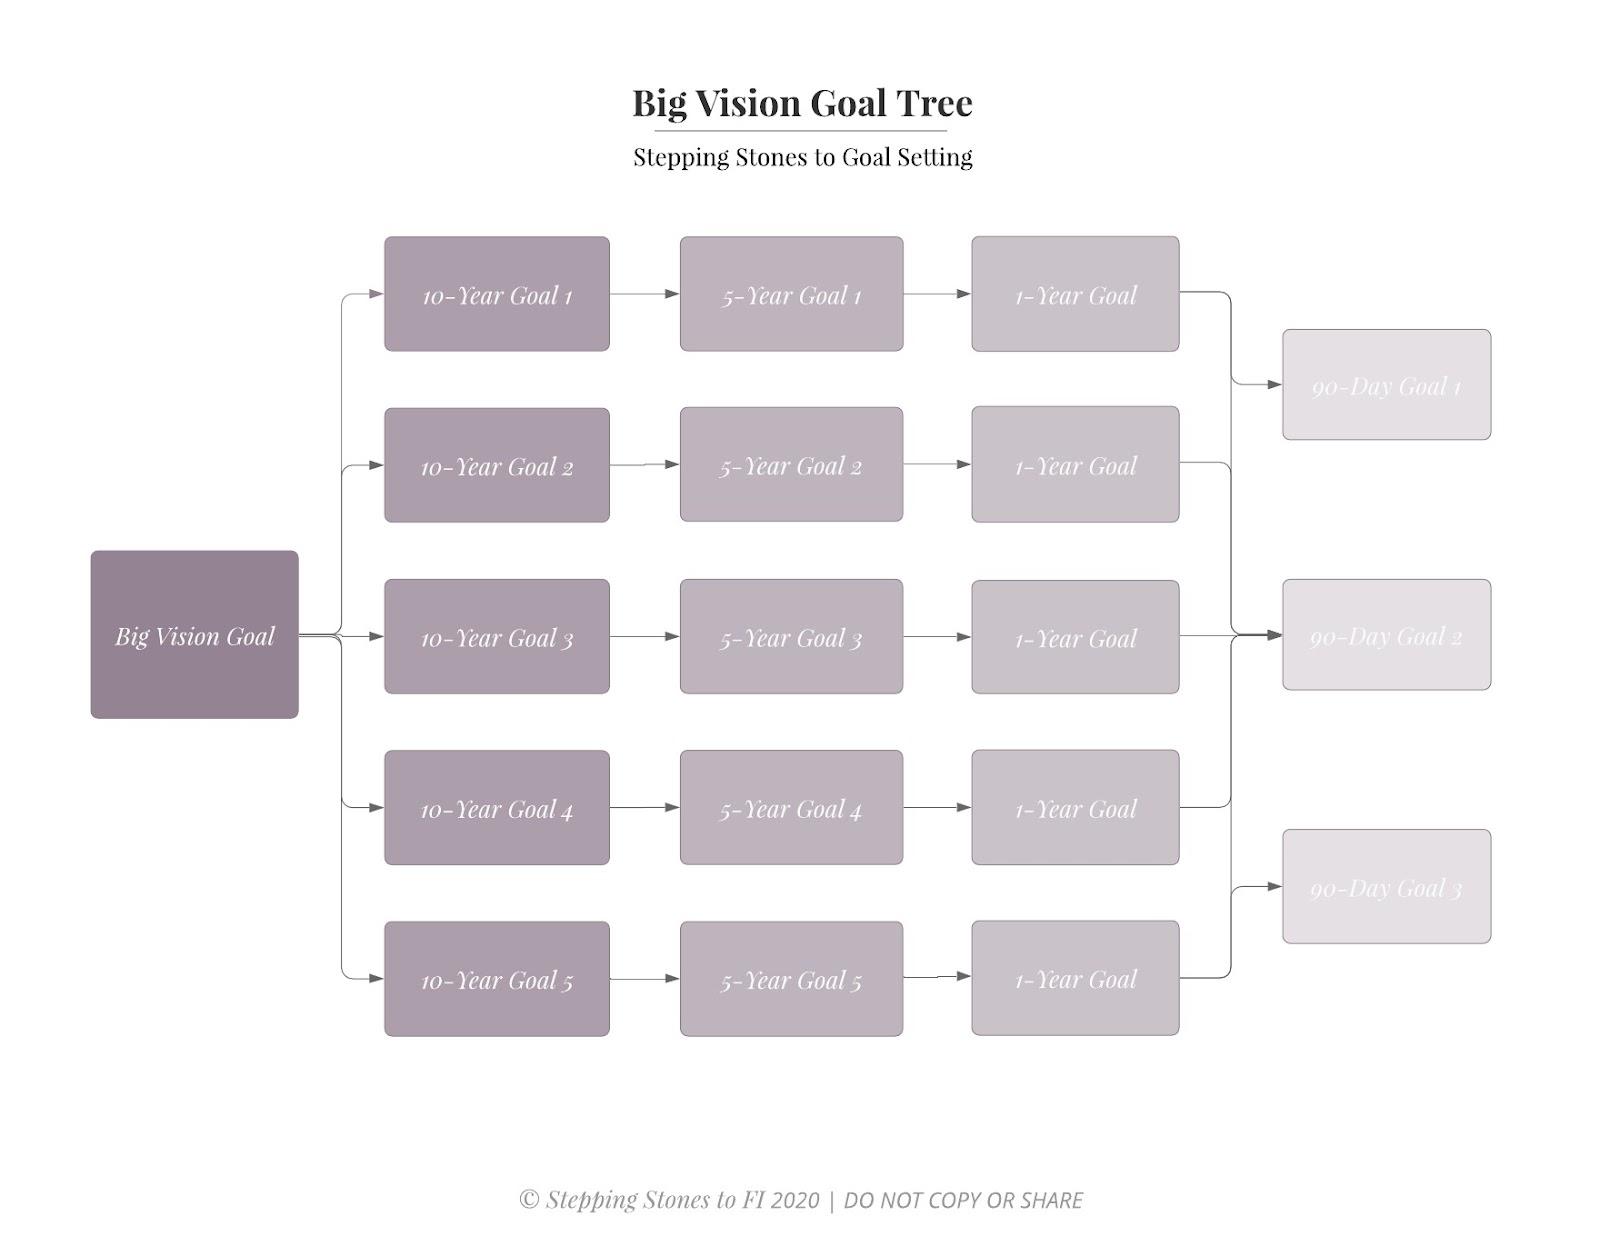 Long-term goal tree example